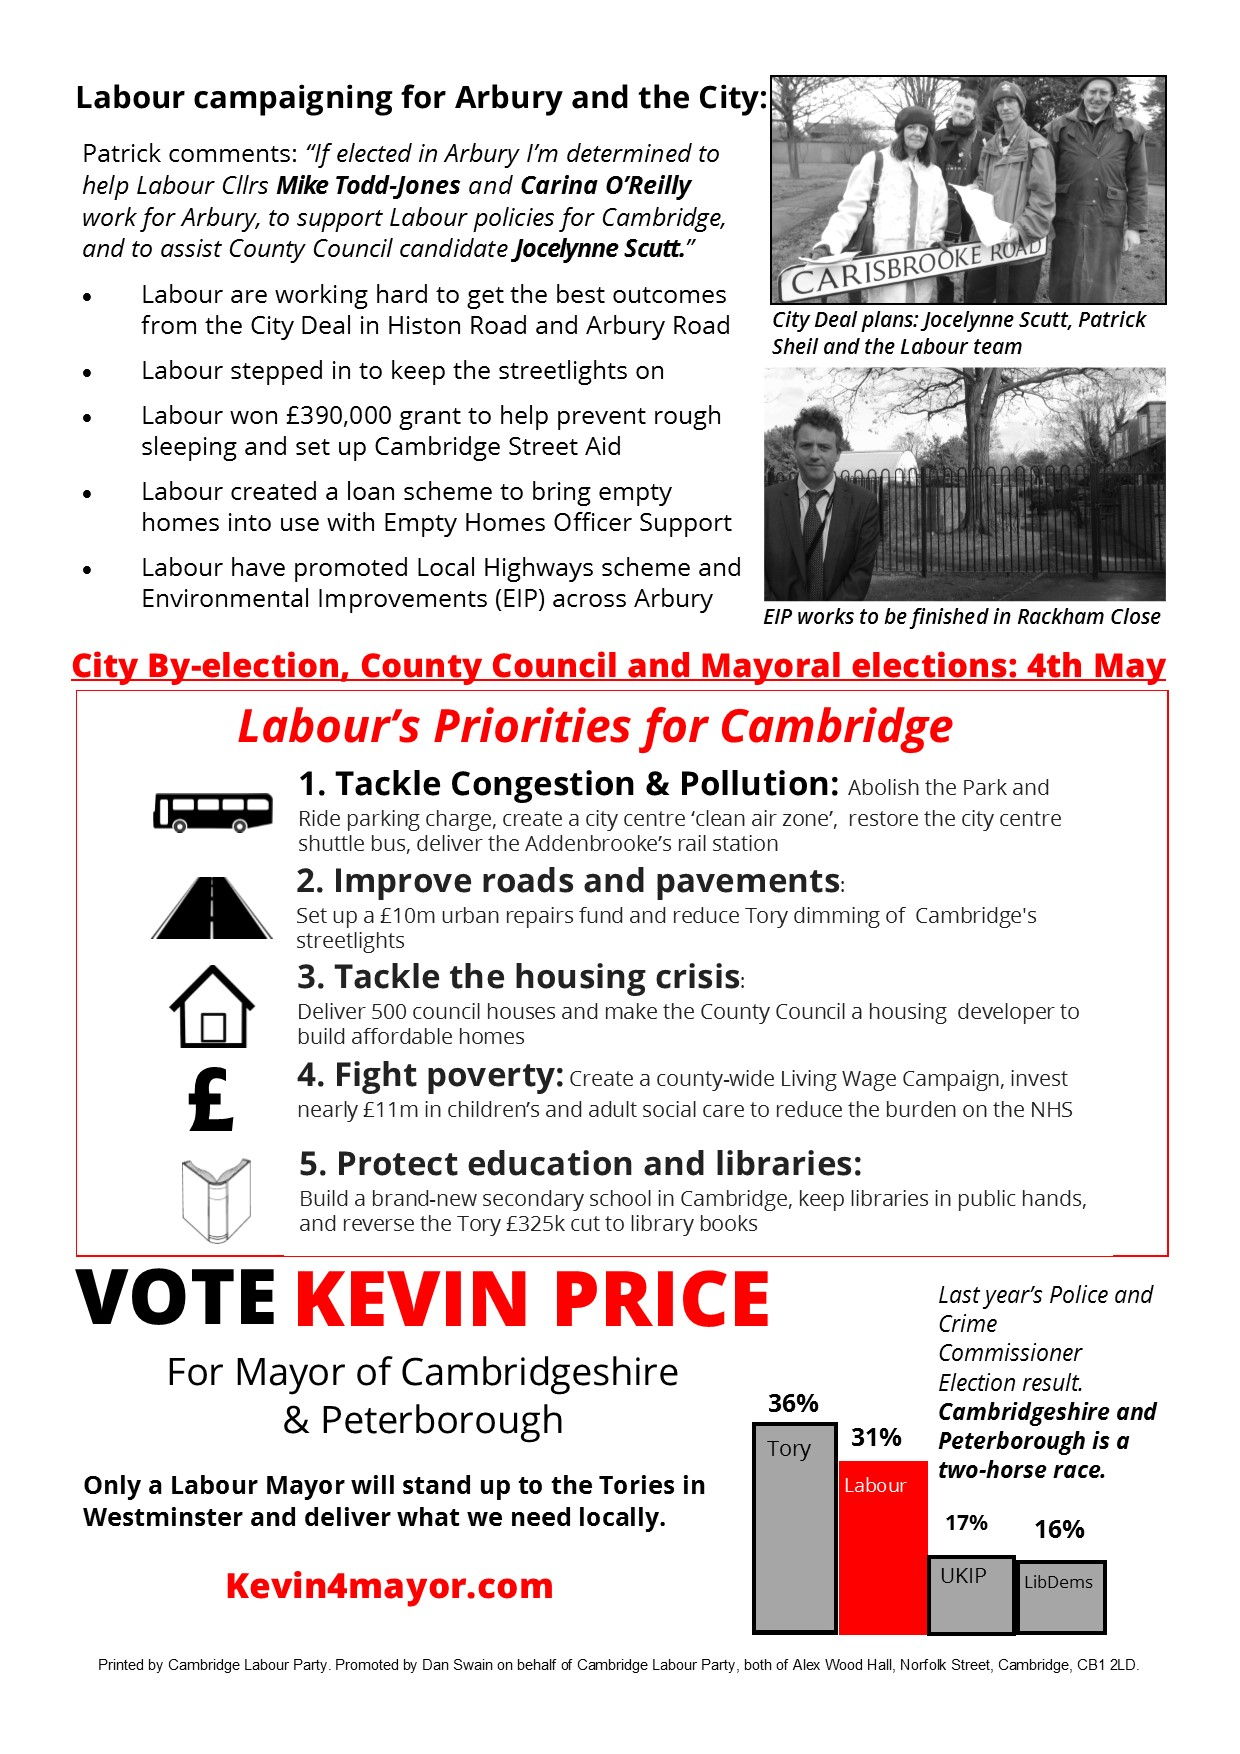 Arbury_By-election_copy.jpg